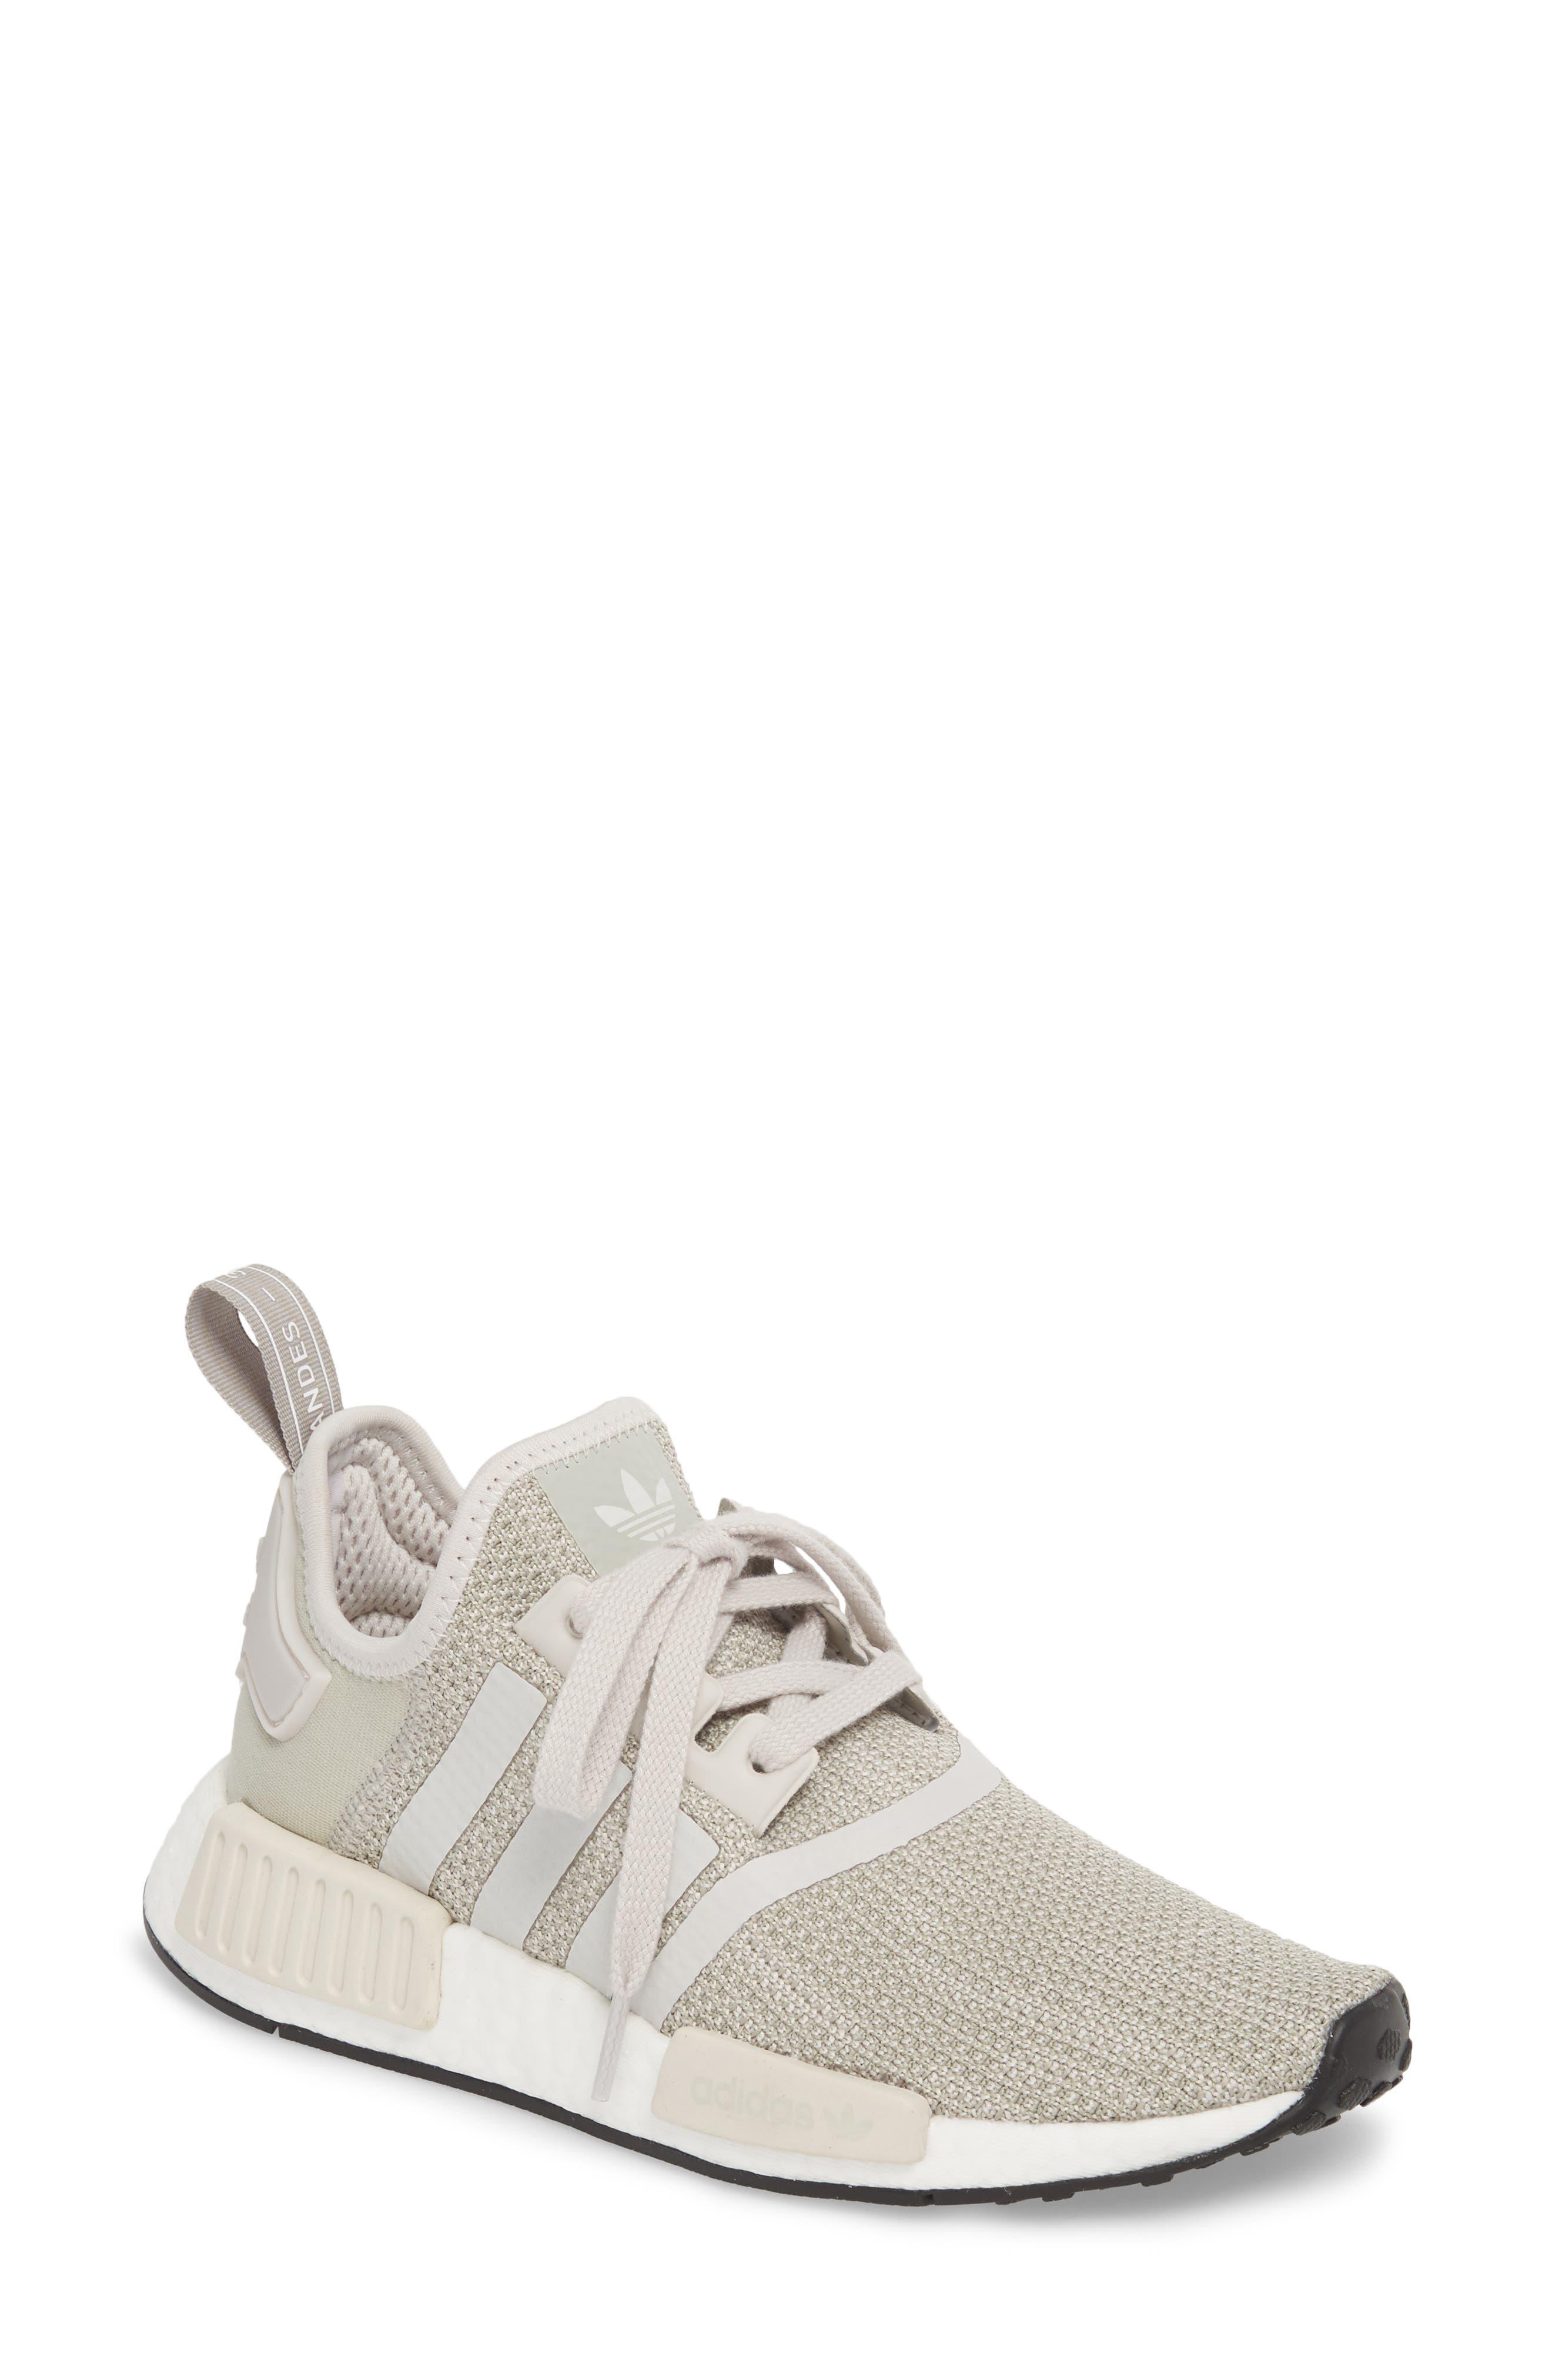 Main Image - adidas NMD R1 Athletic Shoe (Women)